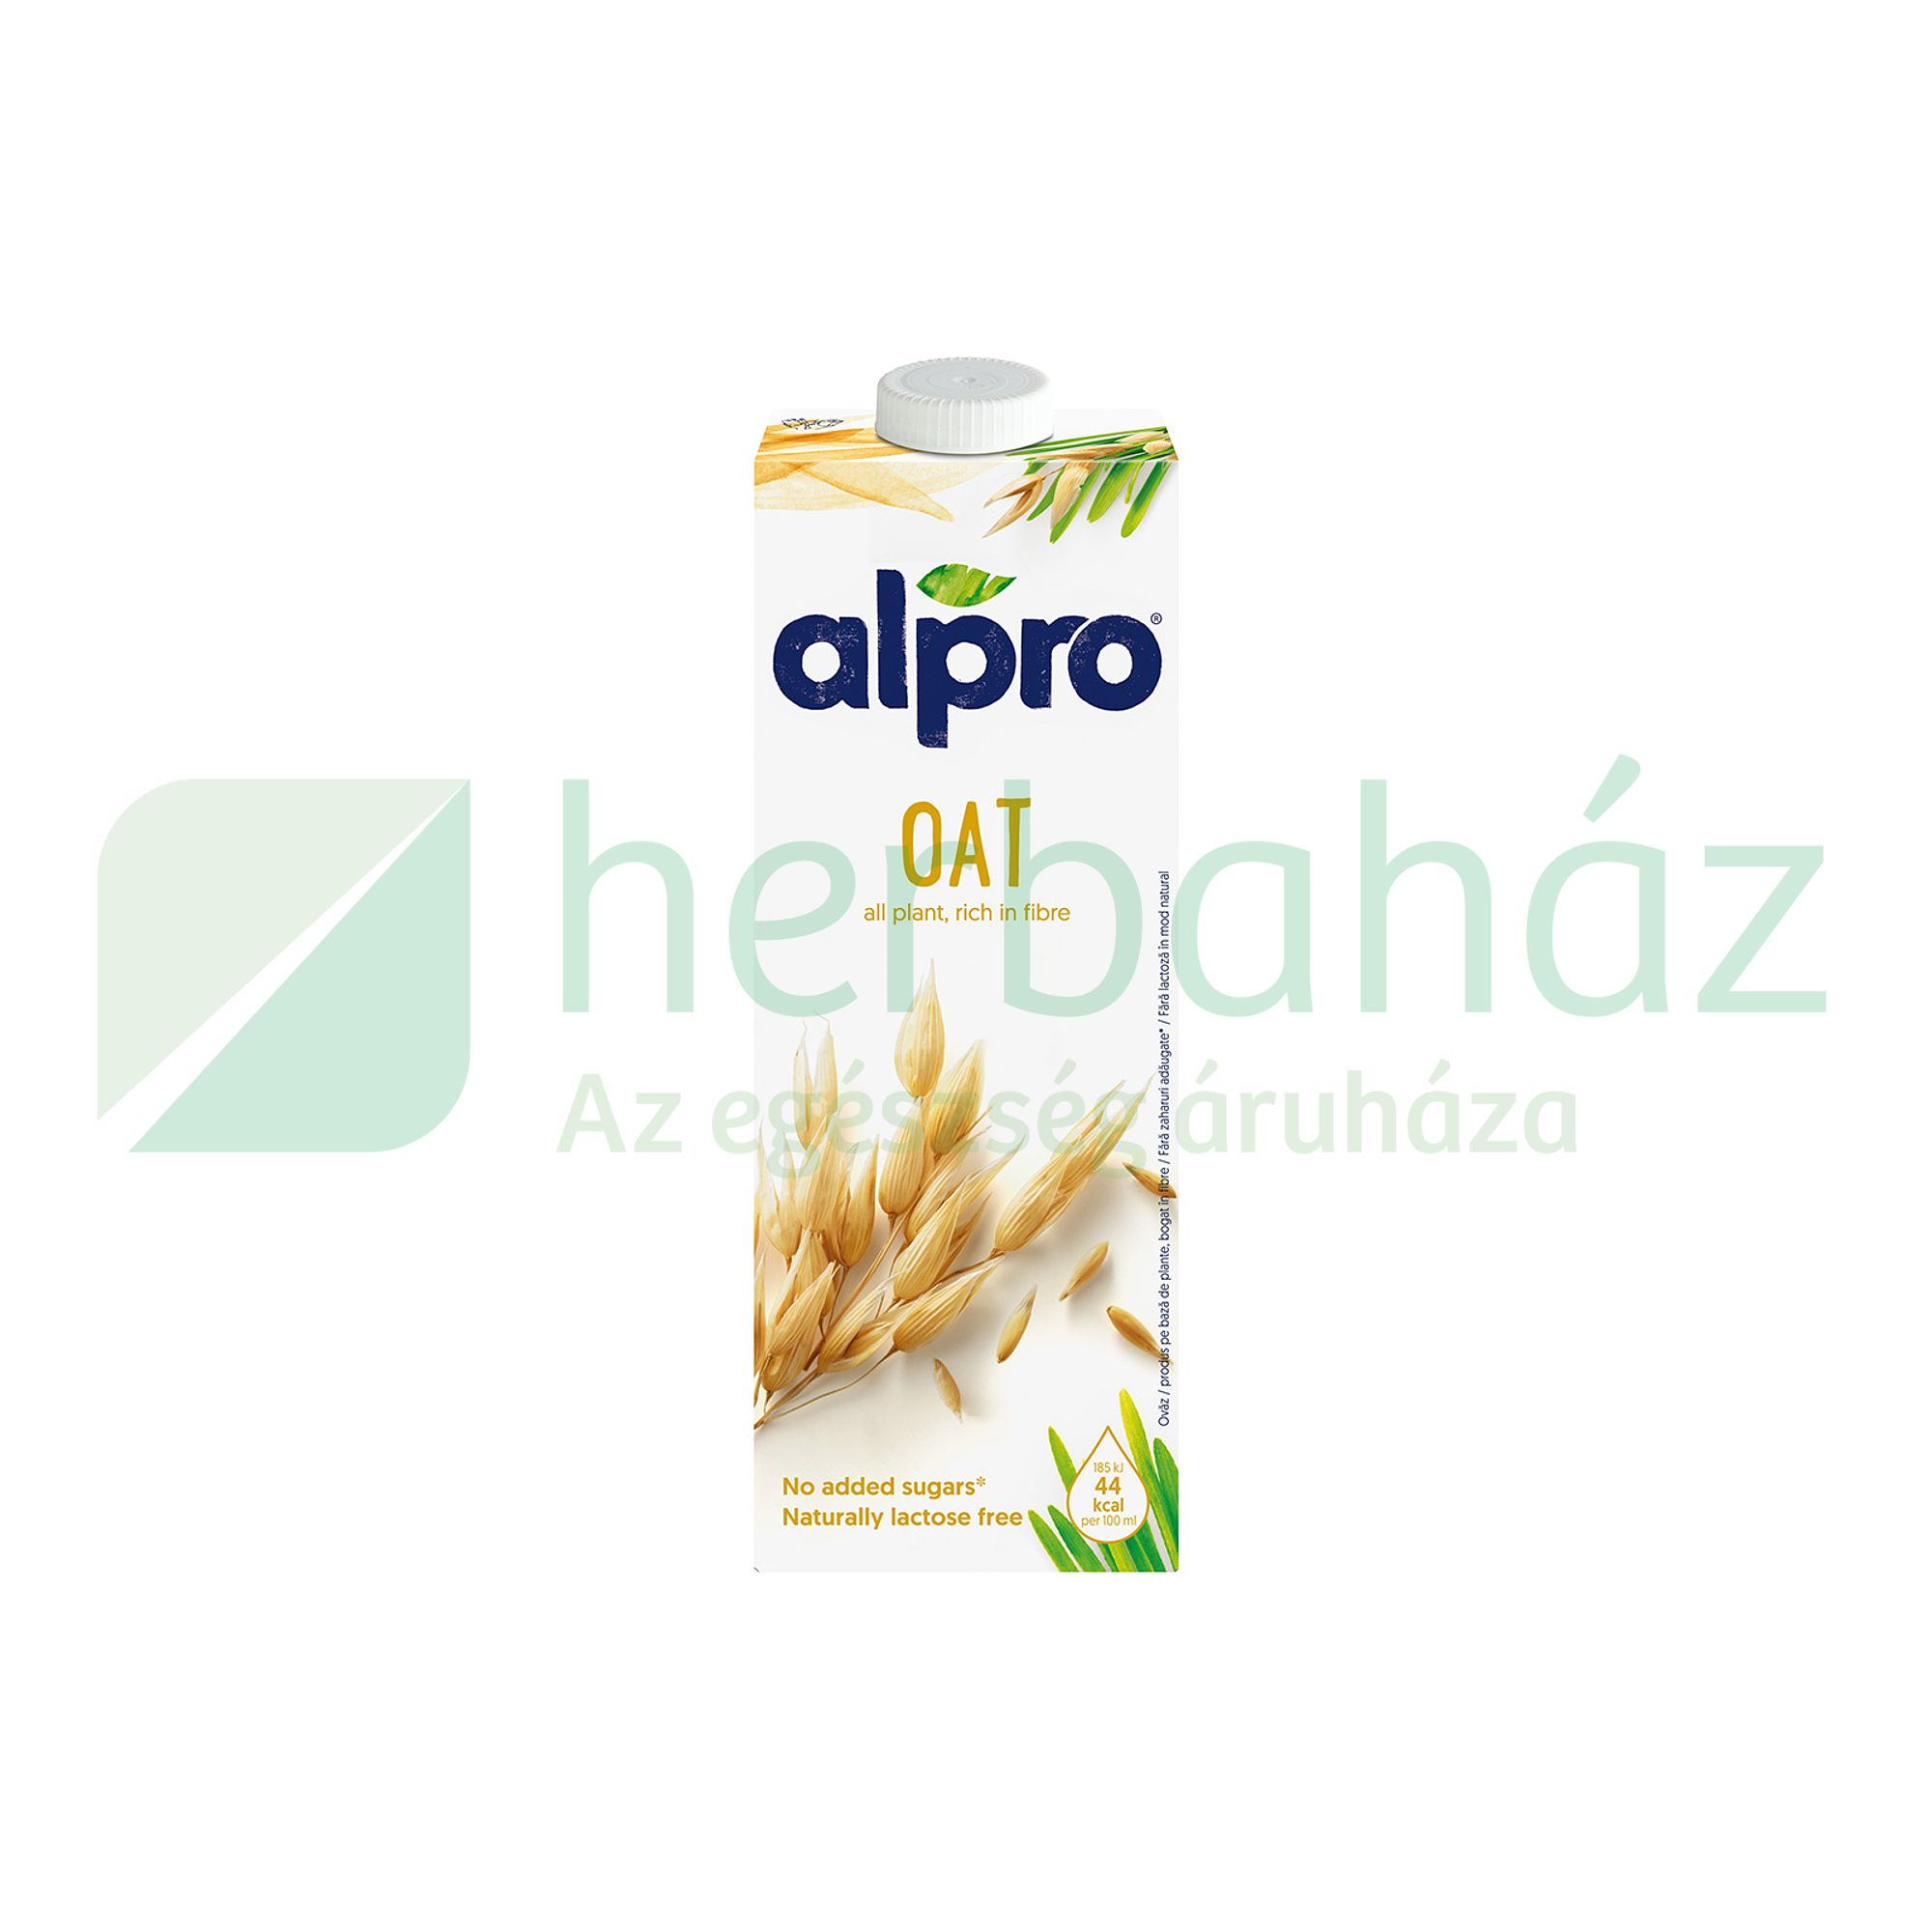 ALPRO ZABITAL 1000ML